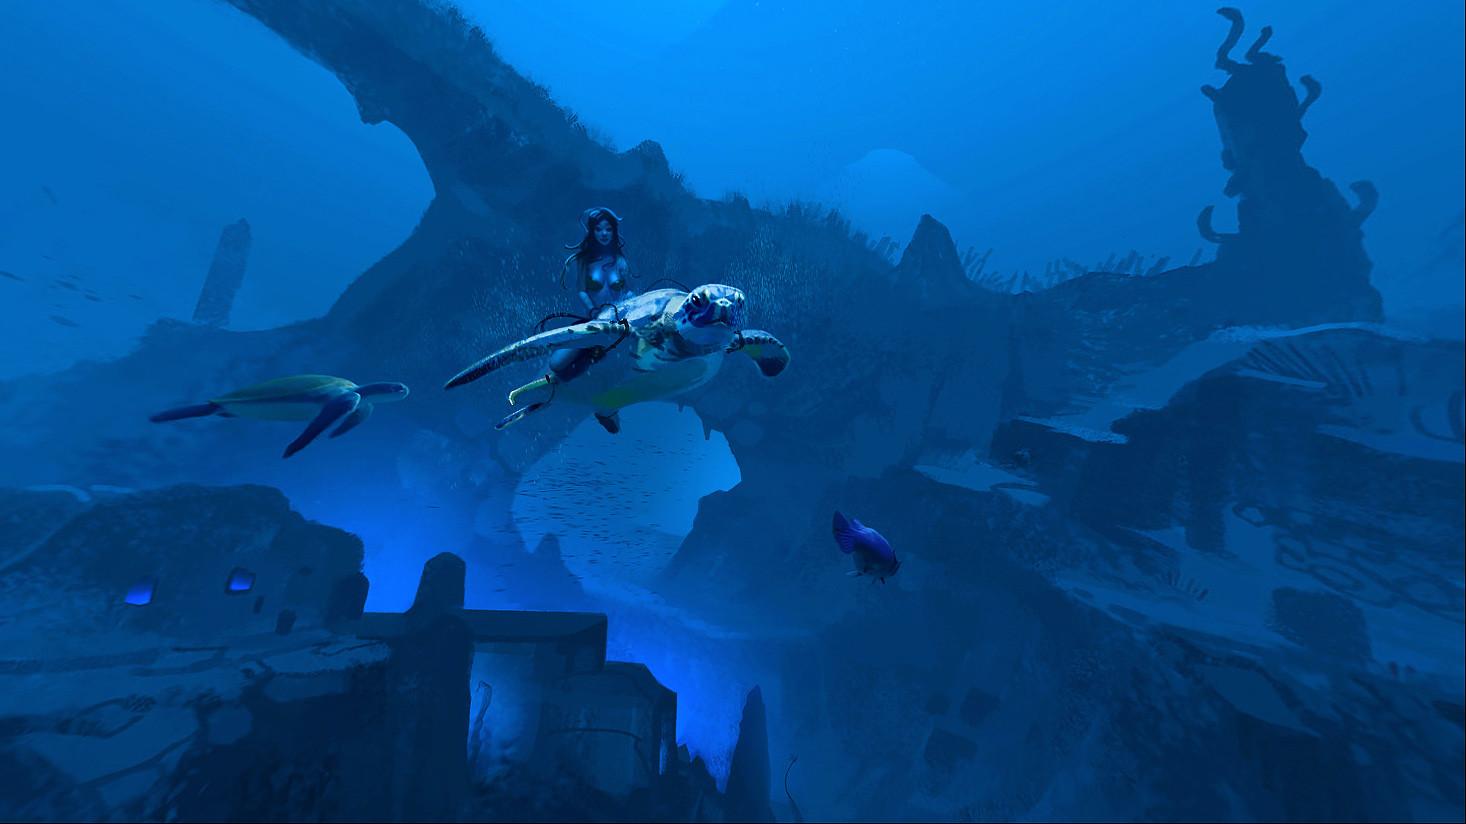 Lorenz hideyoshi ruwwe underwater frame6